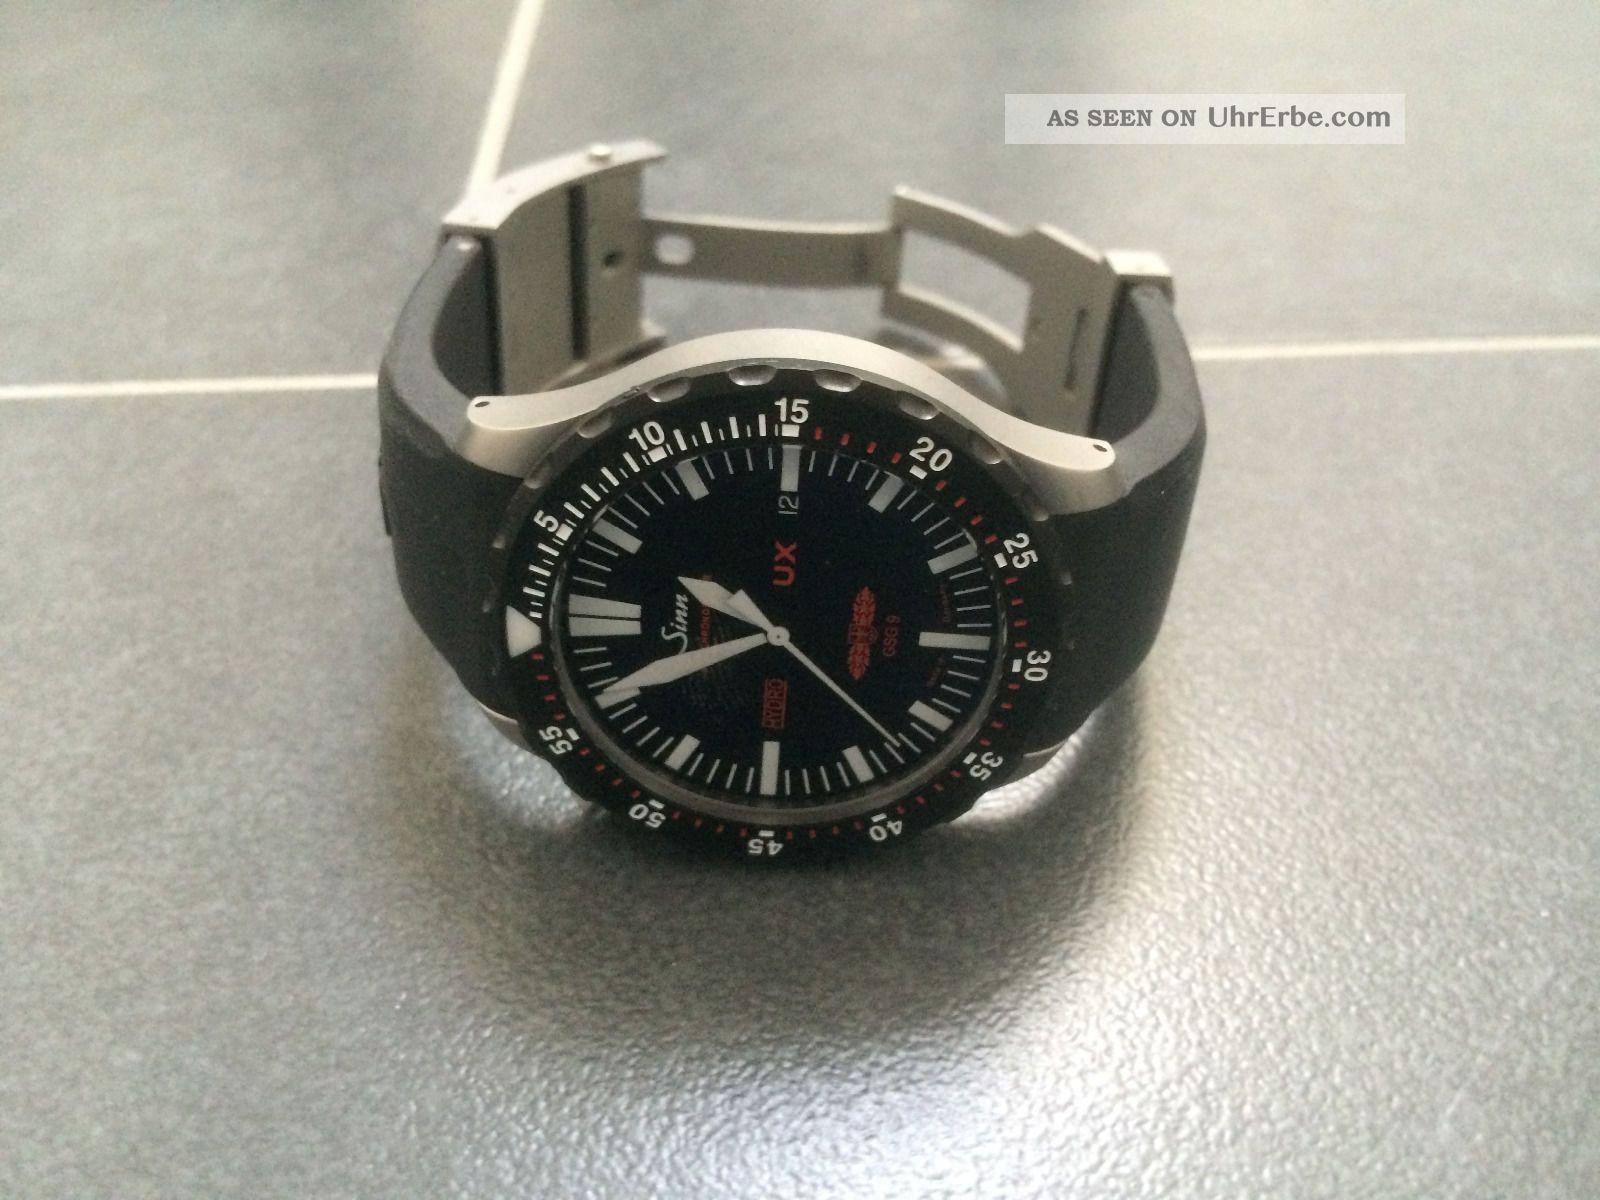 Sinn Ux Gsg 9 Sdr Armbanduhren Bild